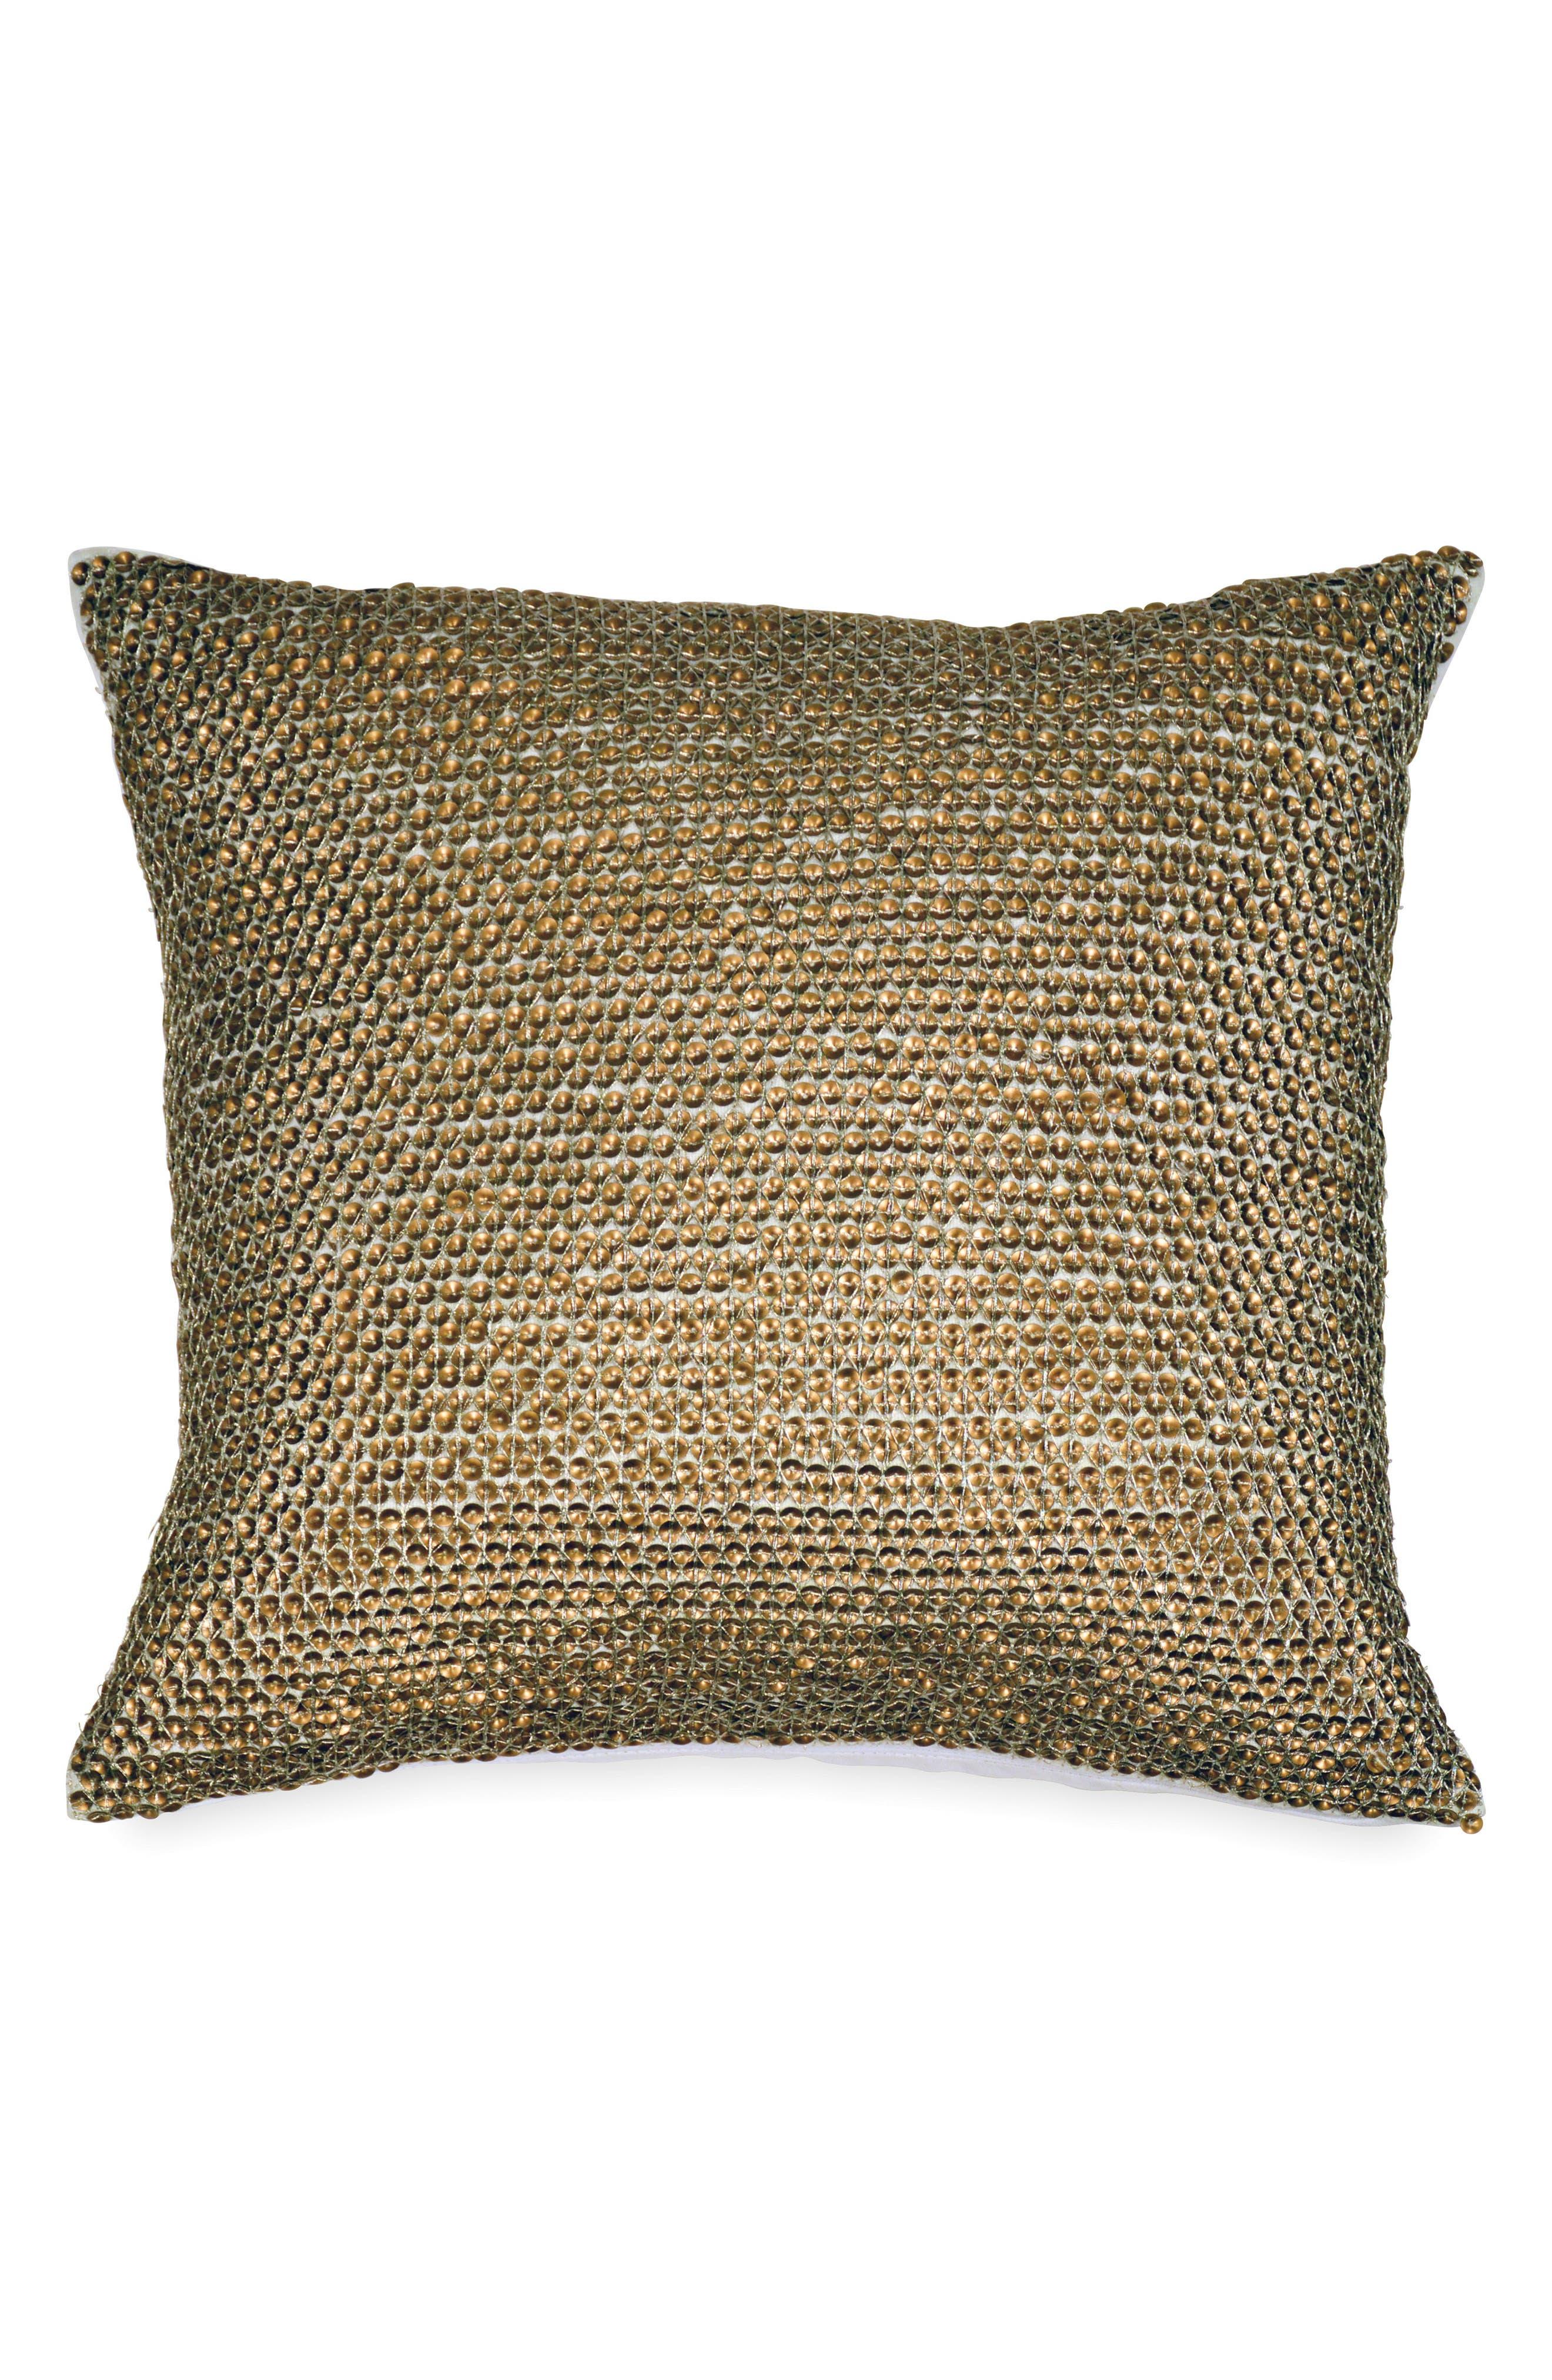 Donna Karan Vapor Sequin Accent Pillow,                         Main,                         color, 710